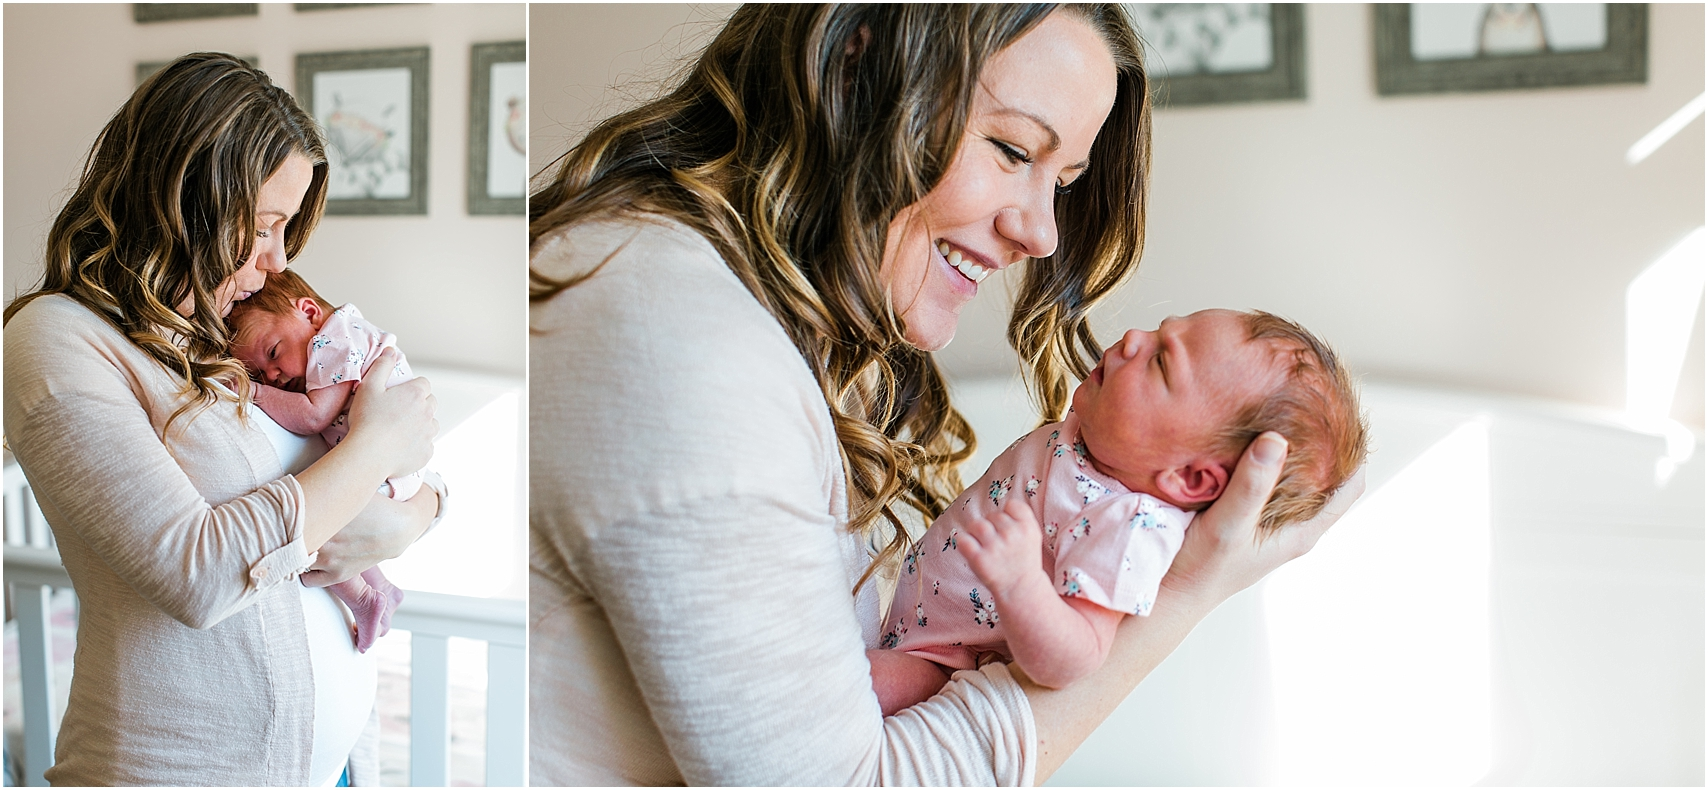 Minnesota Lifestyle In Home Newborn Photography Session Eagan Newborn Photography_0016.jpg